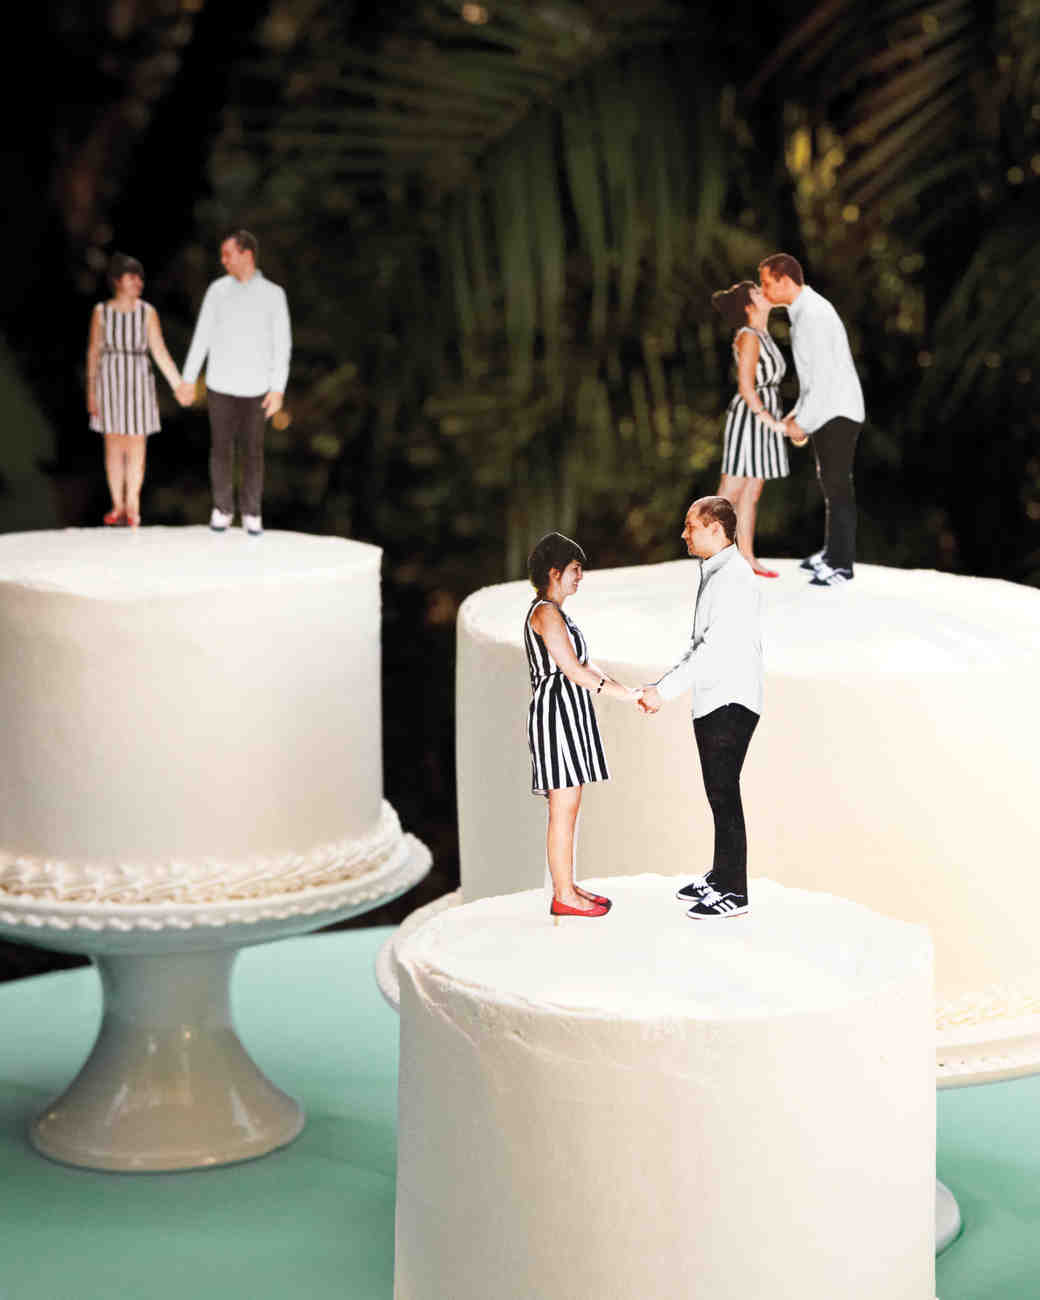 cakes0017-mwd109592.jpg